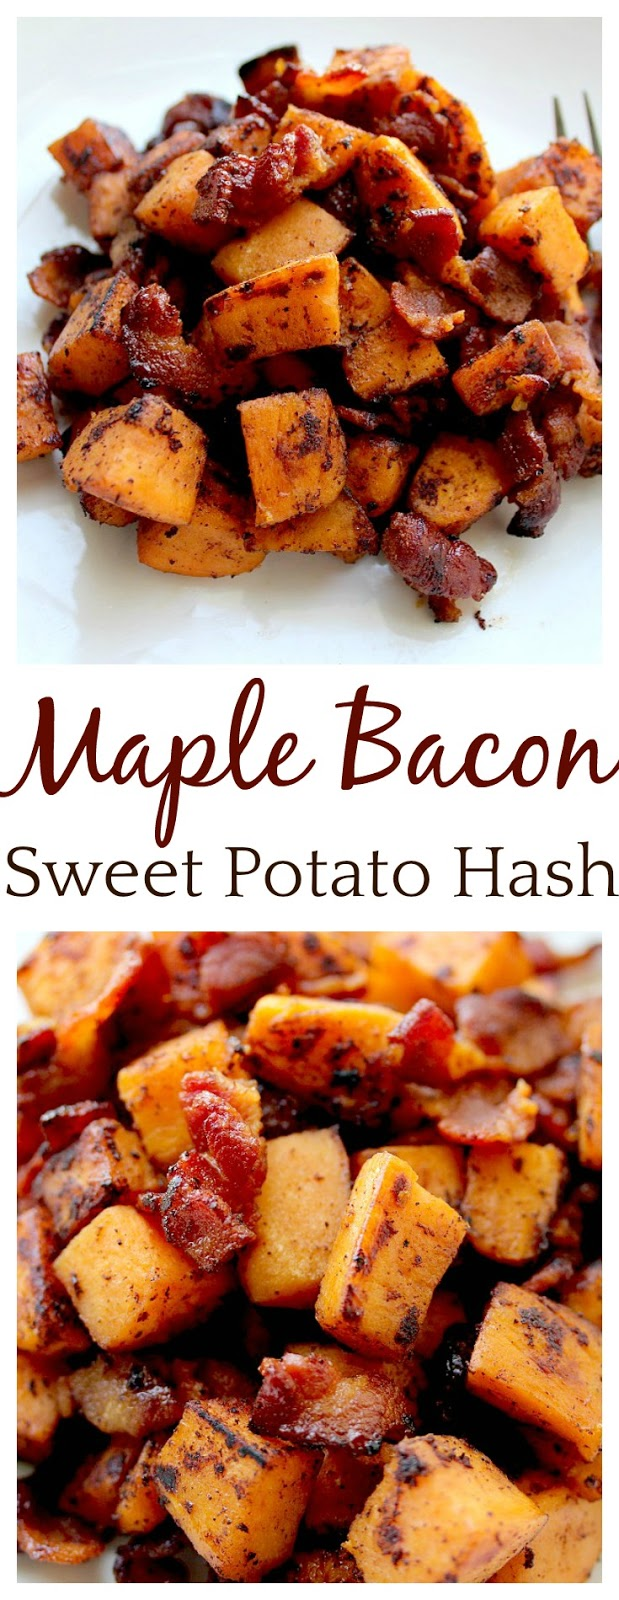 Maple Bacon Sweet Potato Hash Recipe